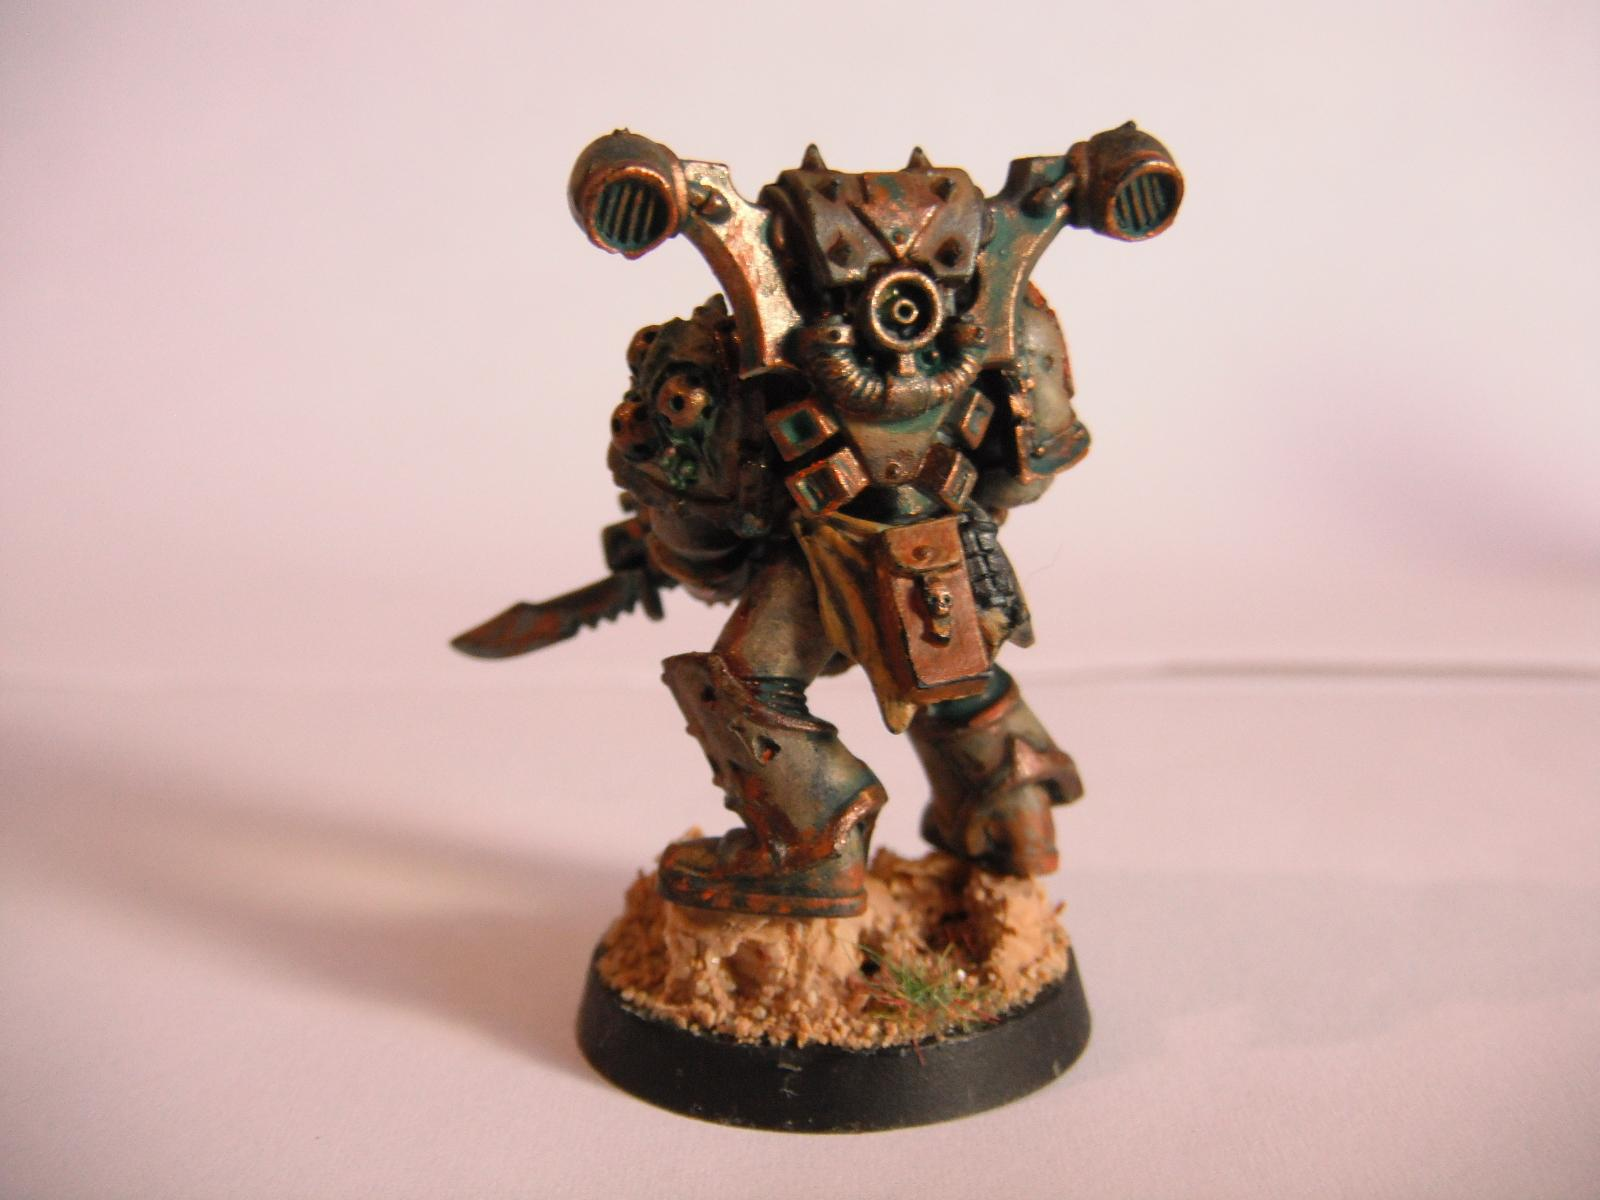 Chaos, Forge World, Nurgle, Plague Marines, Warhammer 40,000